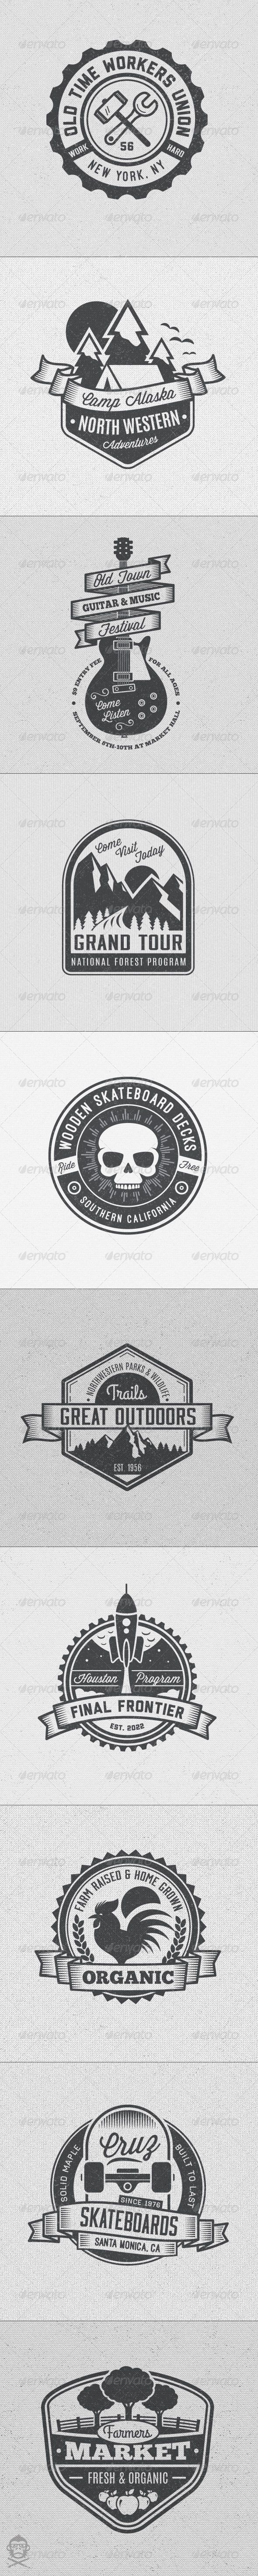 Vintage Style Badges and Logos Vol 4 - Badges & Stickers Web Elements. Logo Illustration Designs,